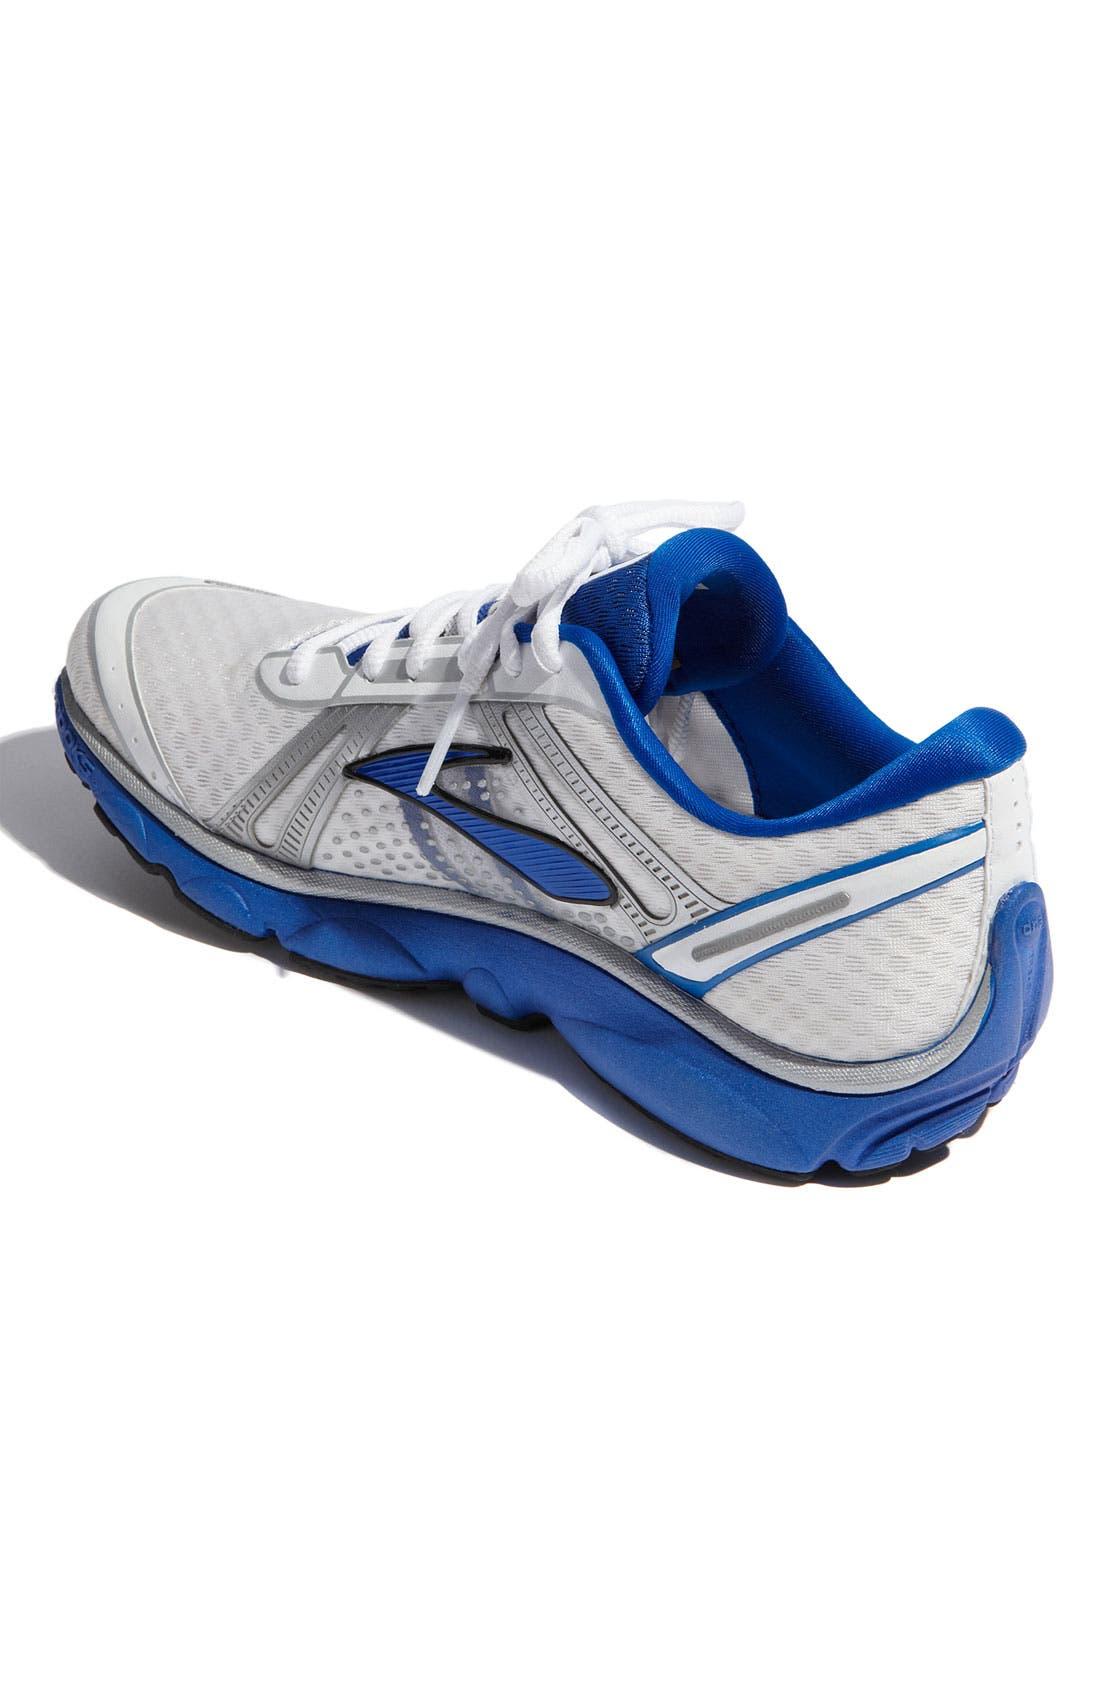 Alternate Image 2  - Brooks 'PureCadence' Running Shoe (Men)